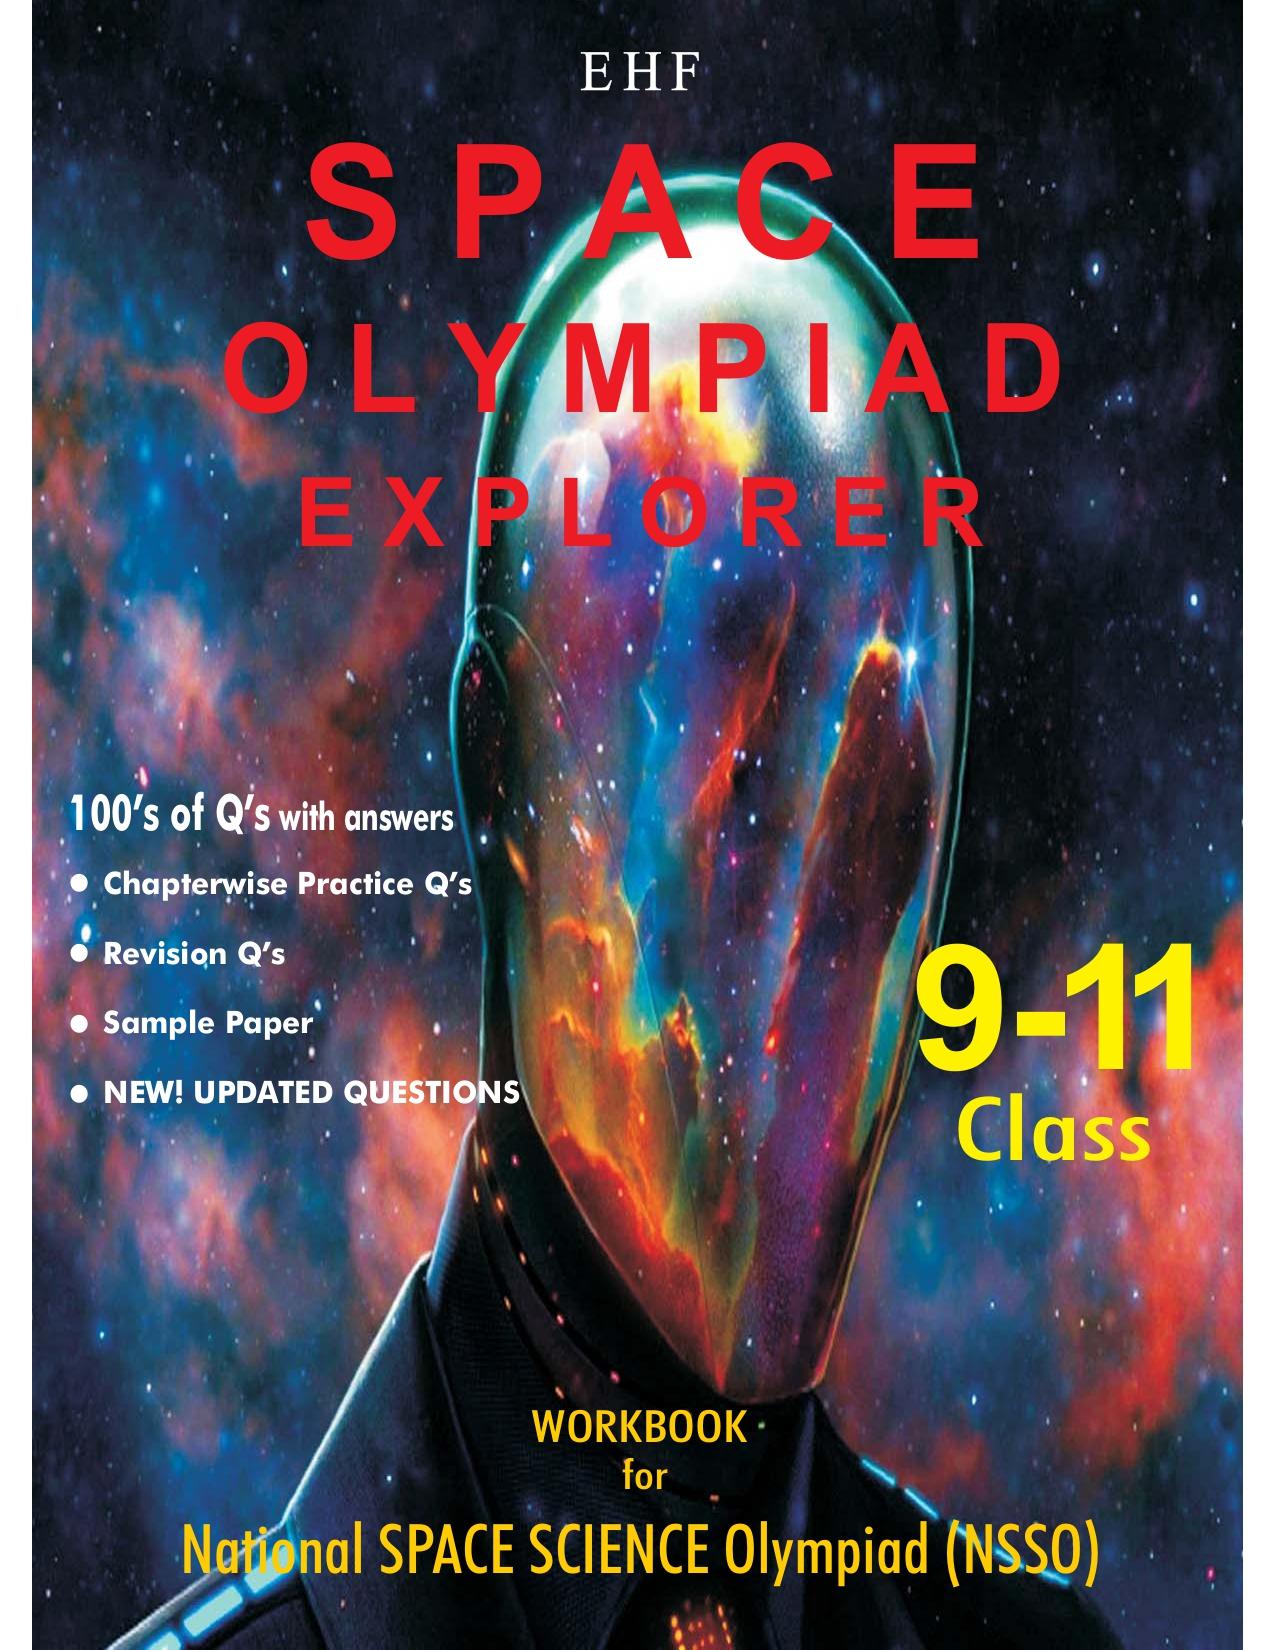 SPACE EXPLORER CLASS 9-11